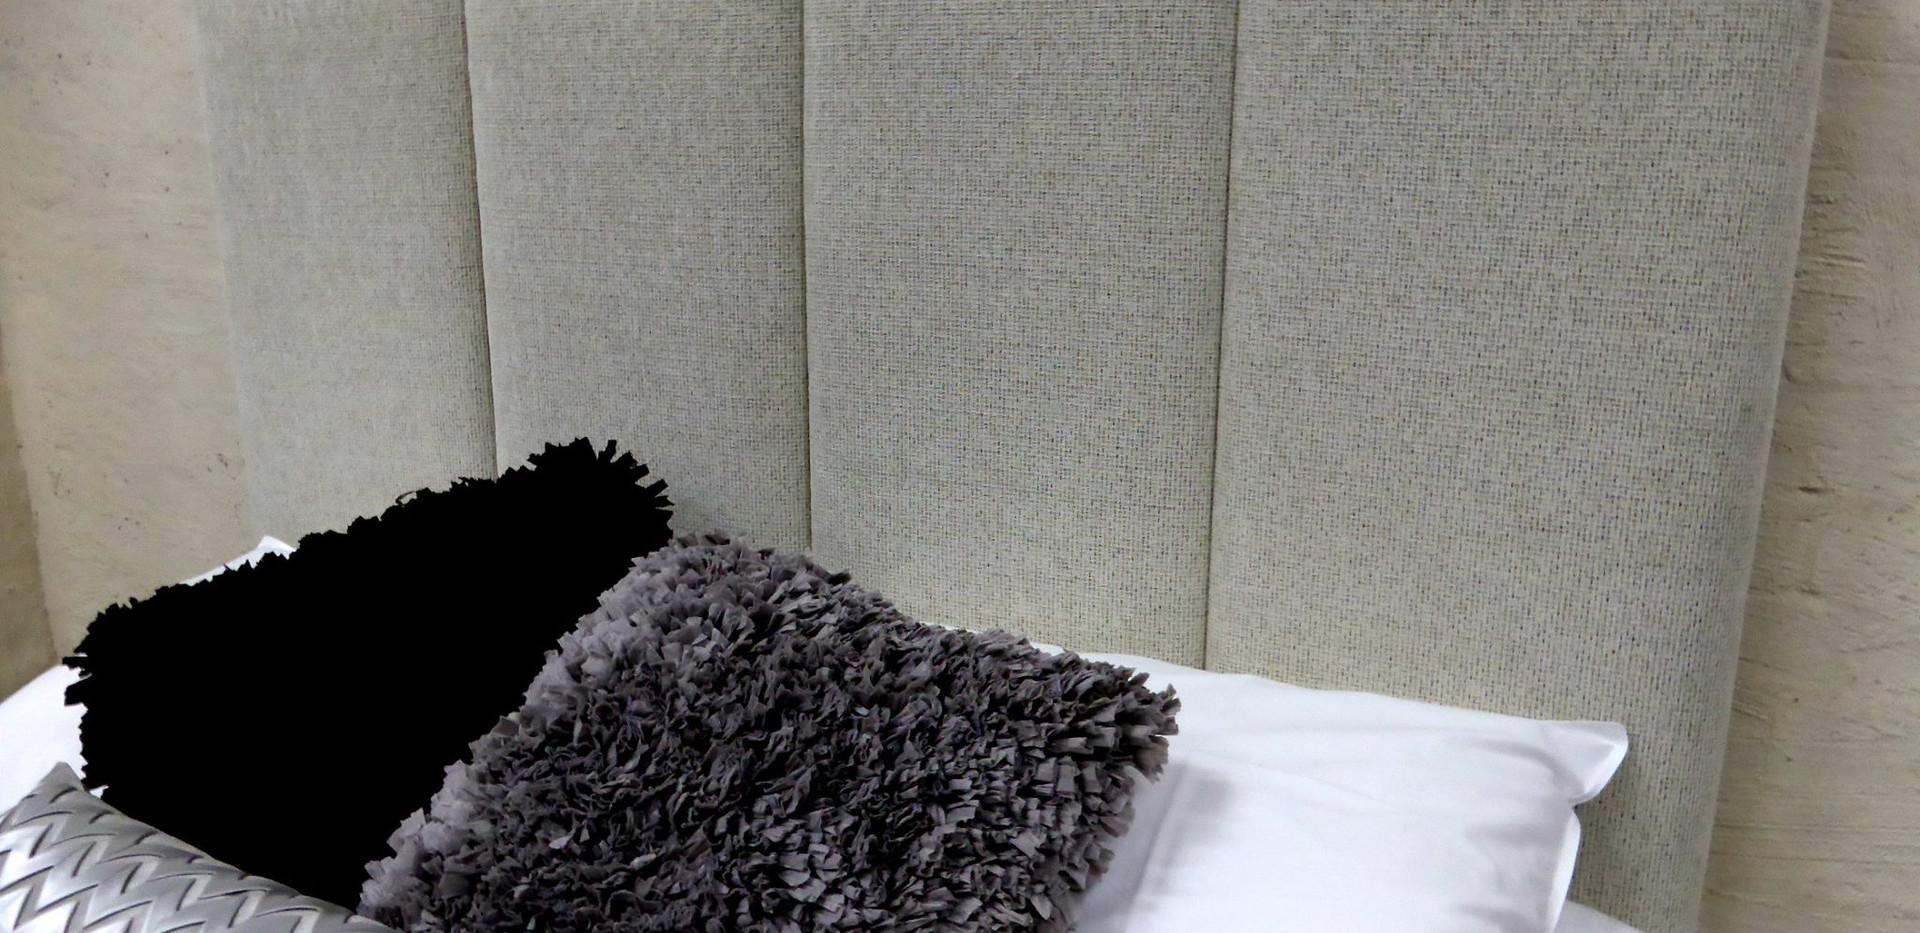 panel upholstered bedhead